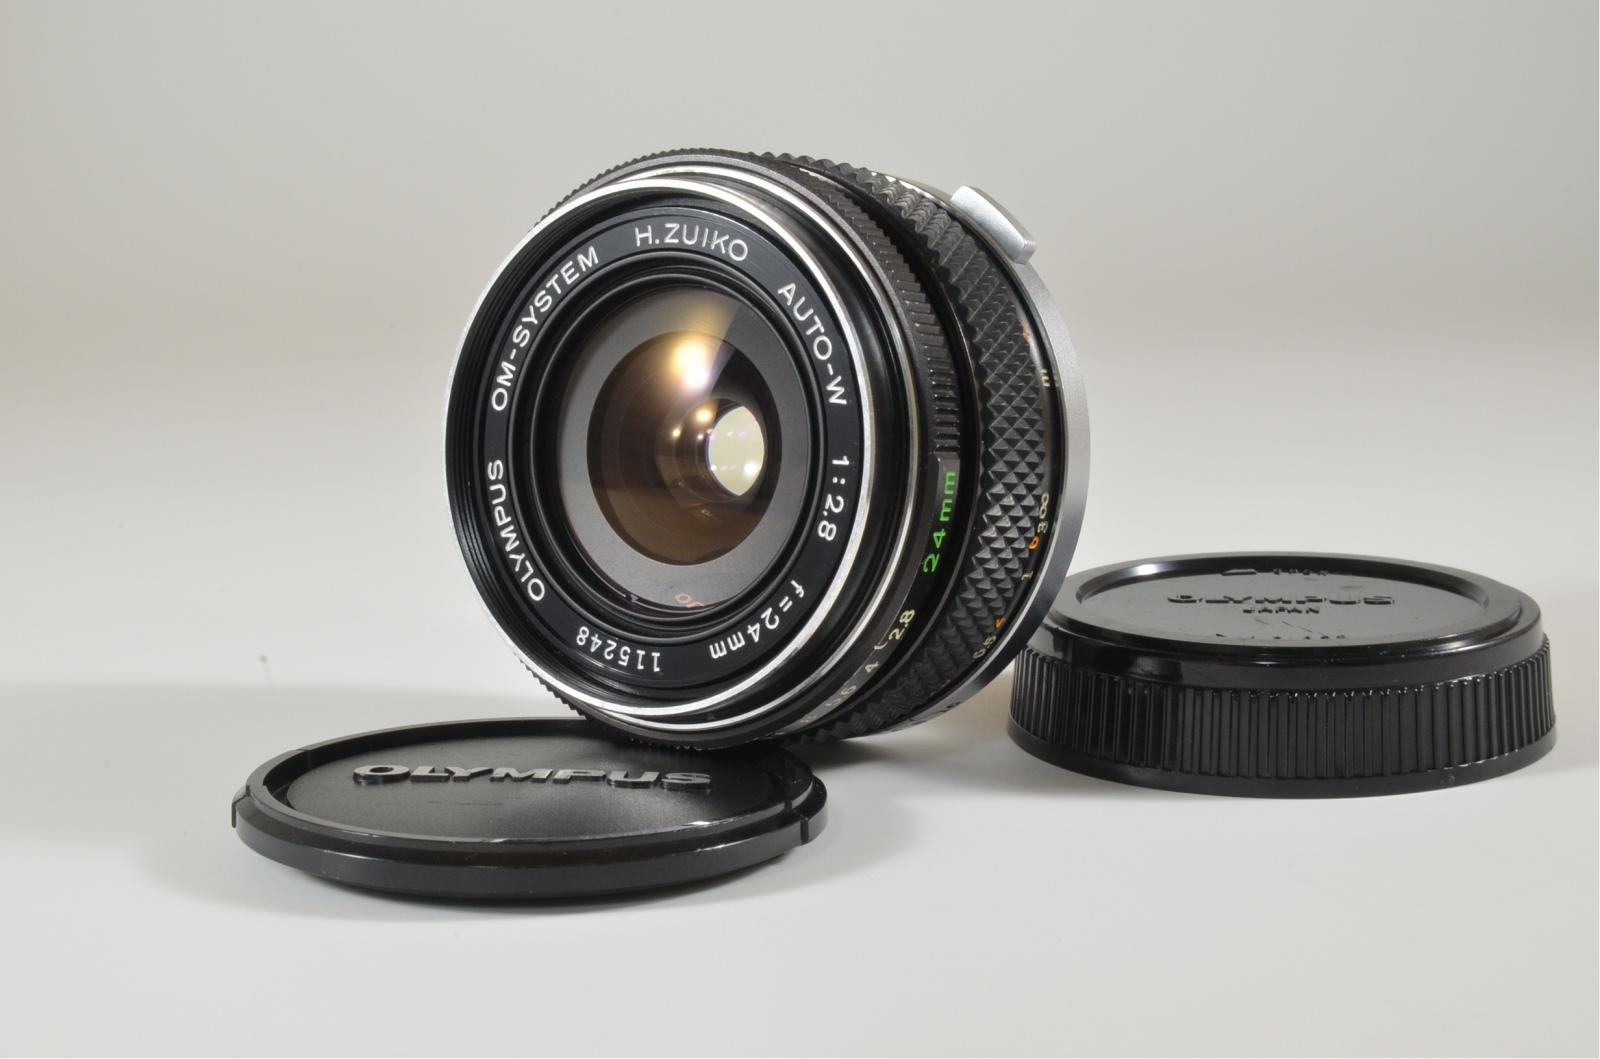 olympus h.zuiko auto-w 24mm f/2.8